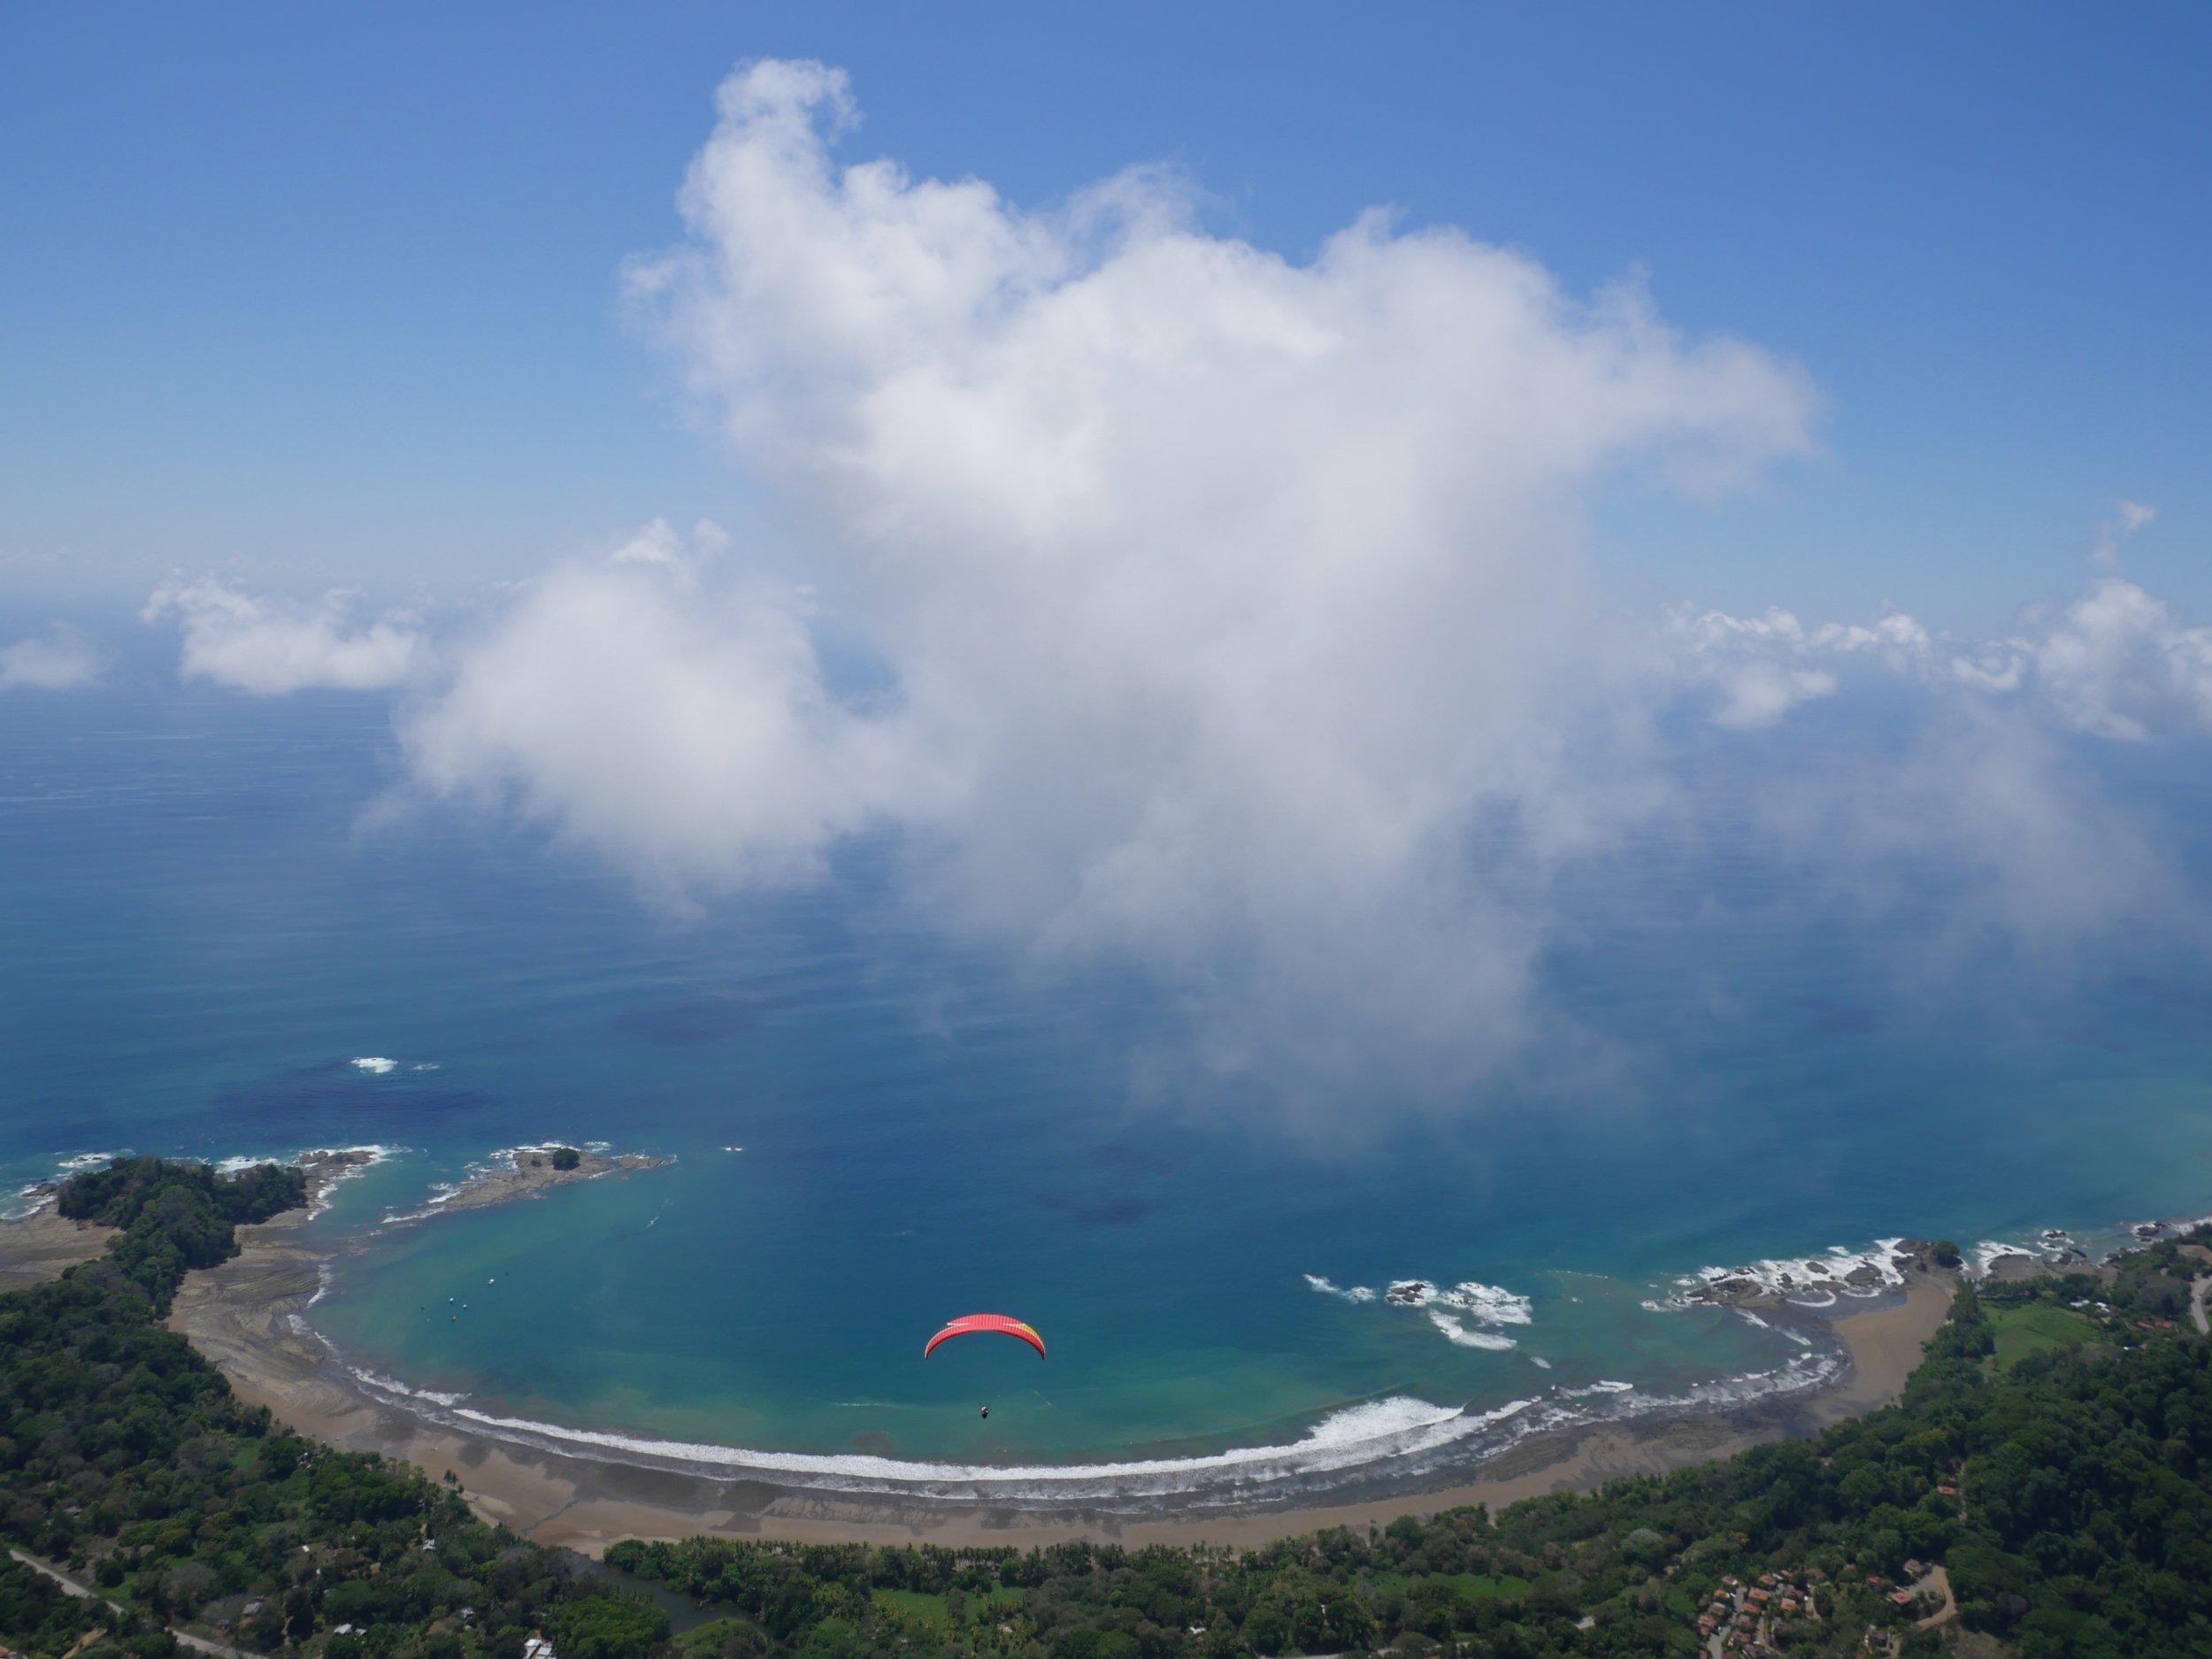 dominical-paragliding-site-landing-lz.jpg